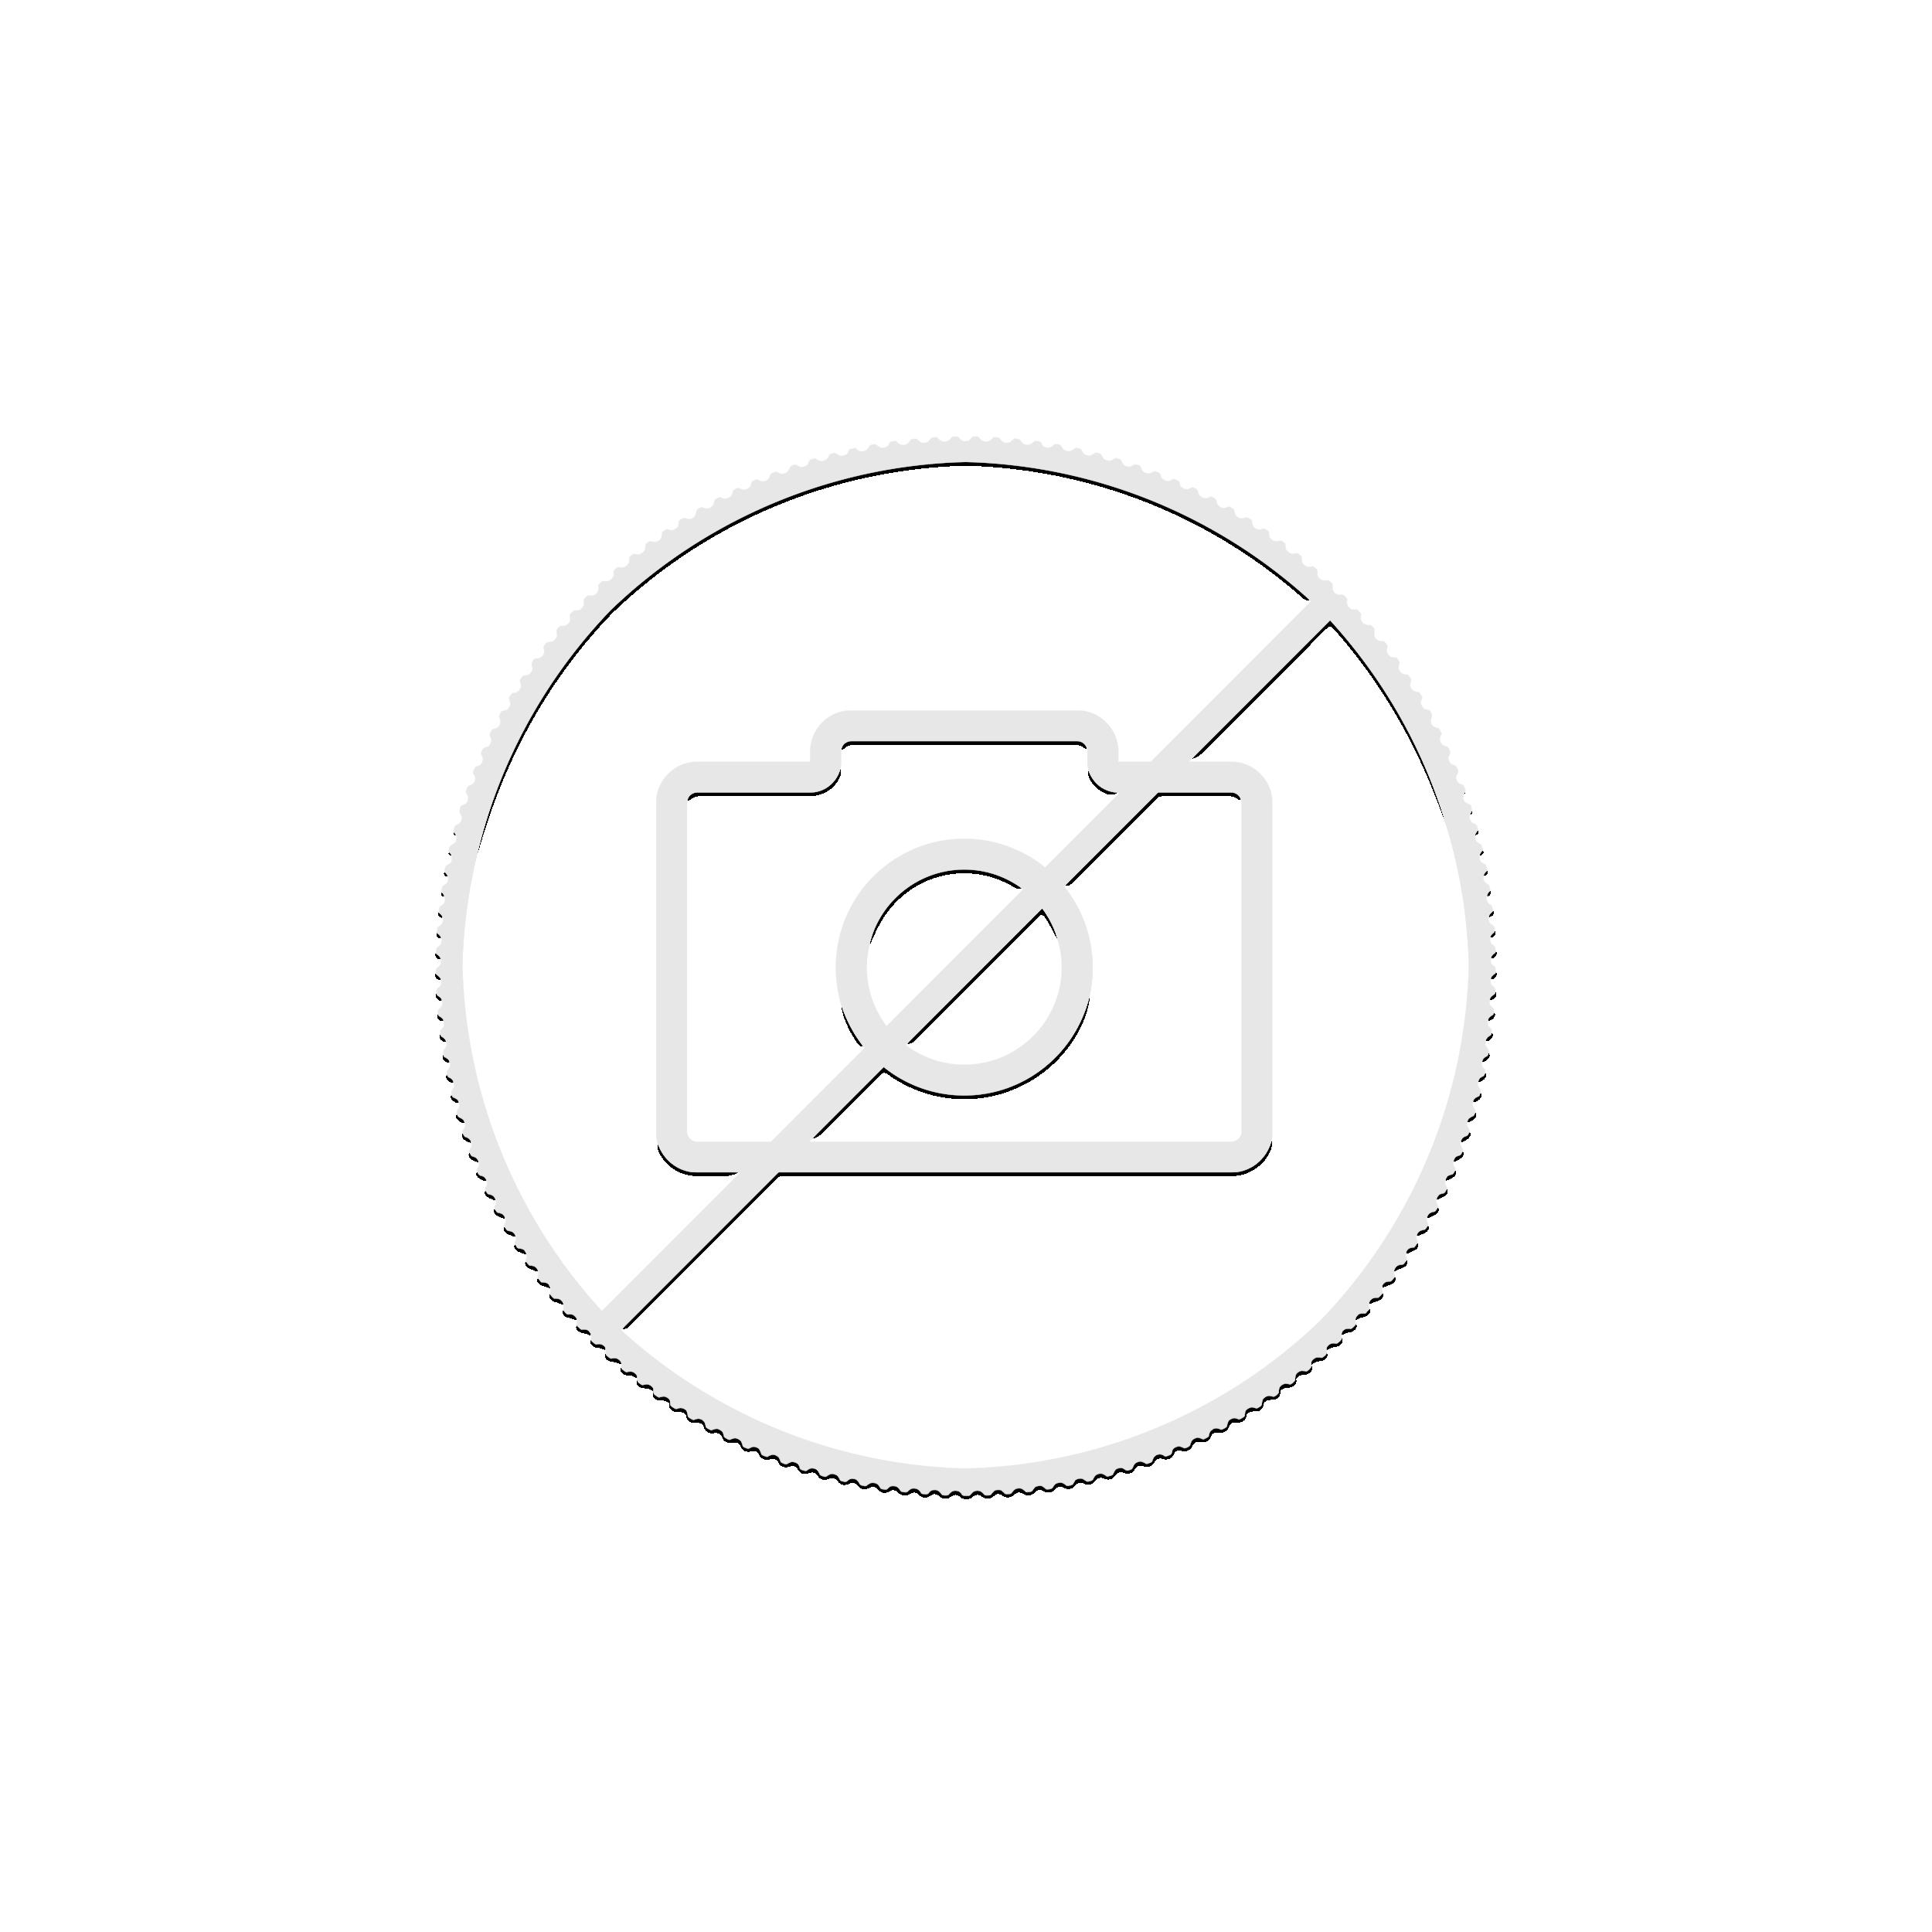 American Eagle gold 2019